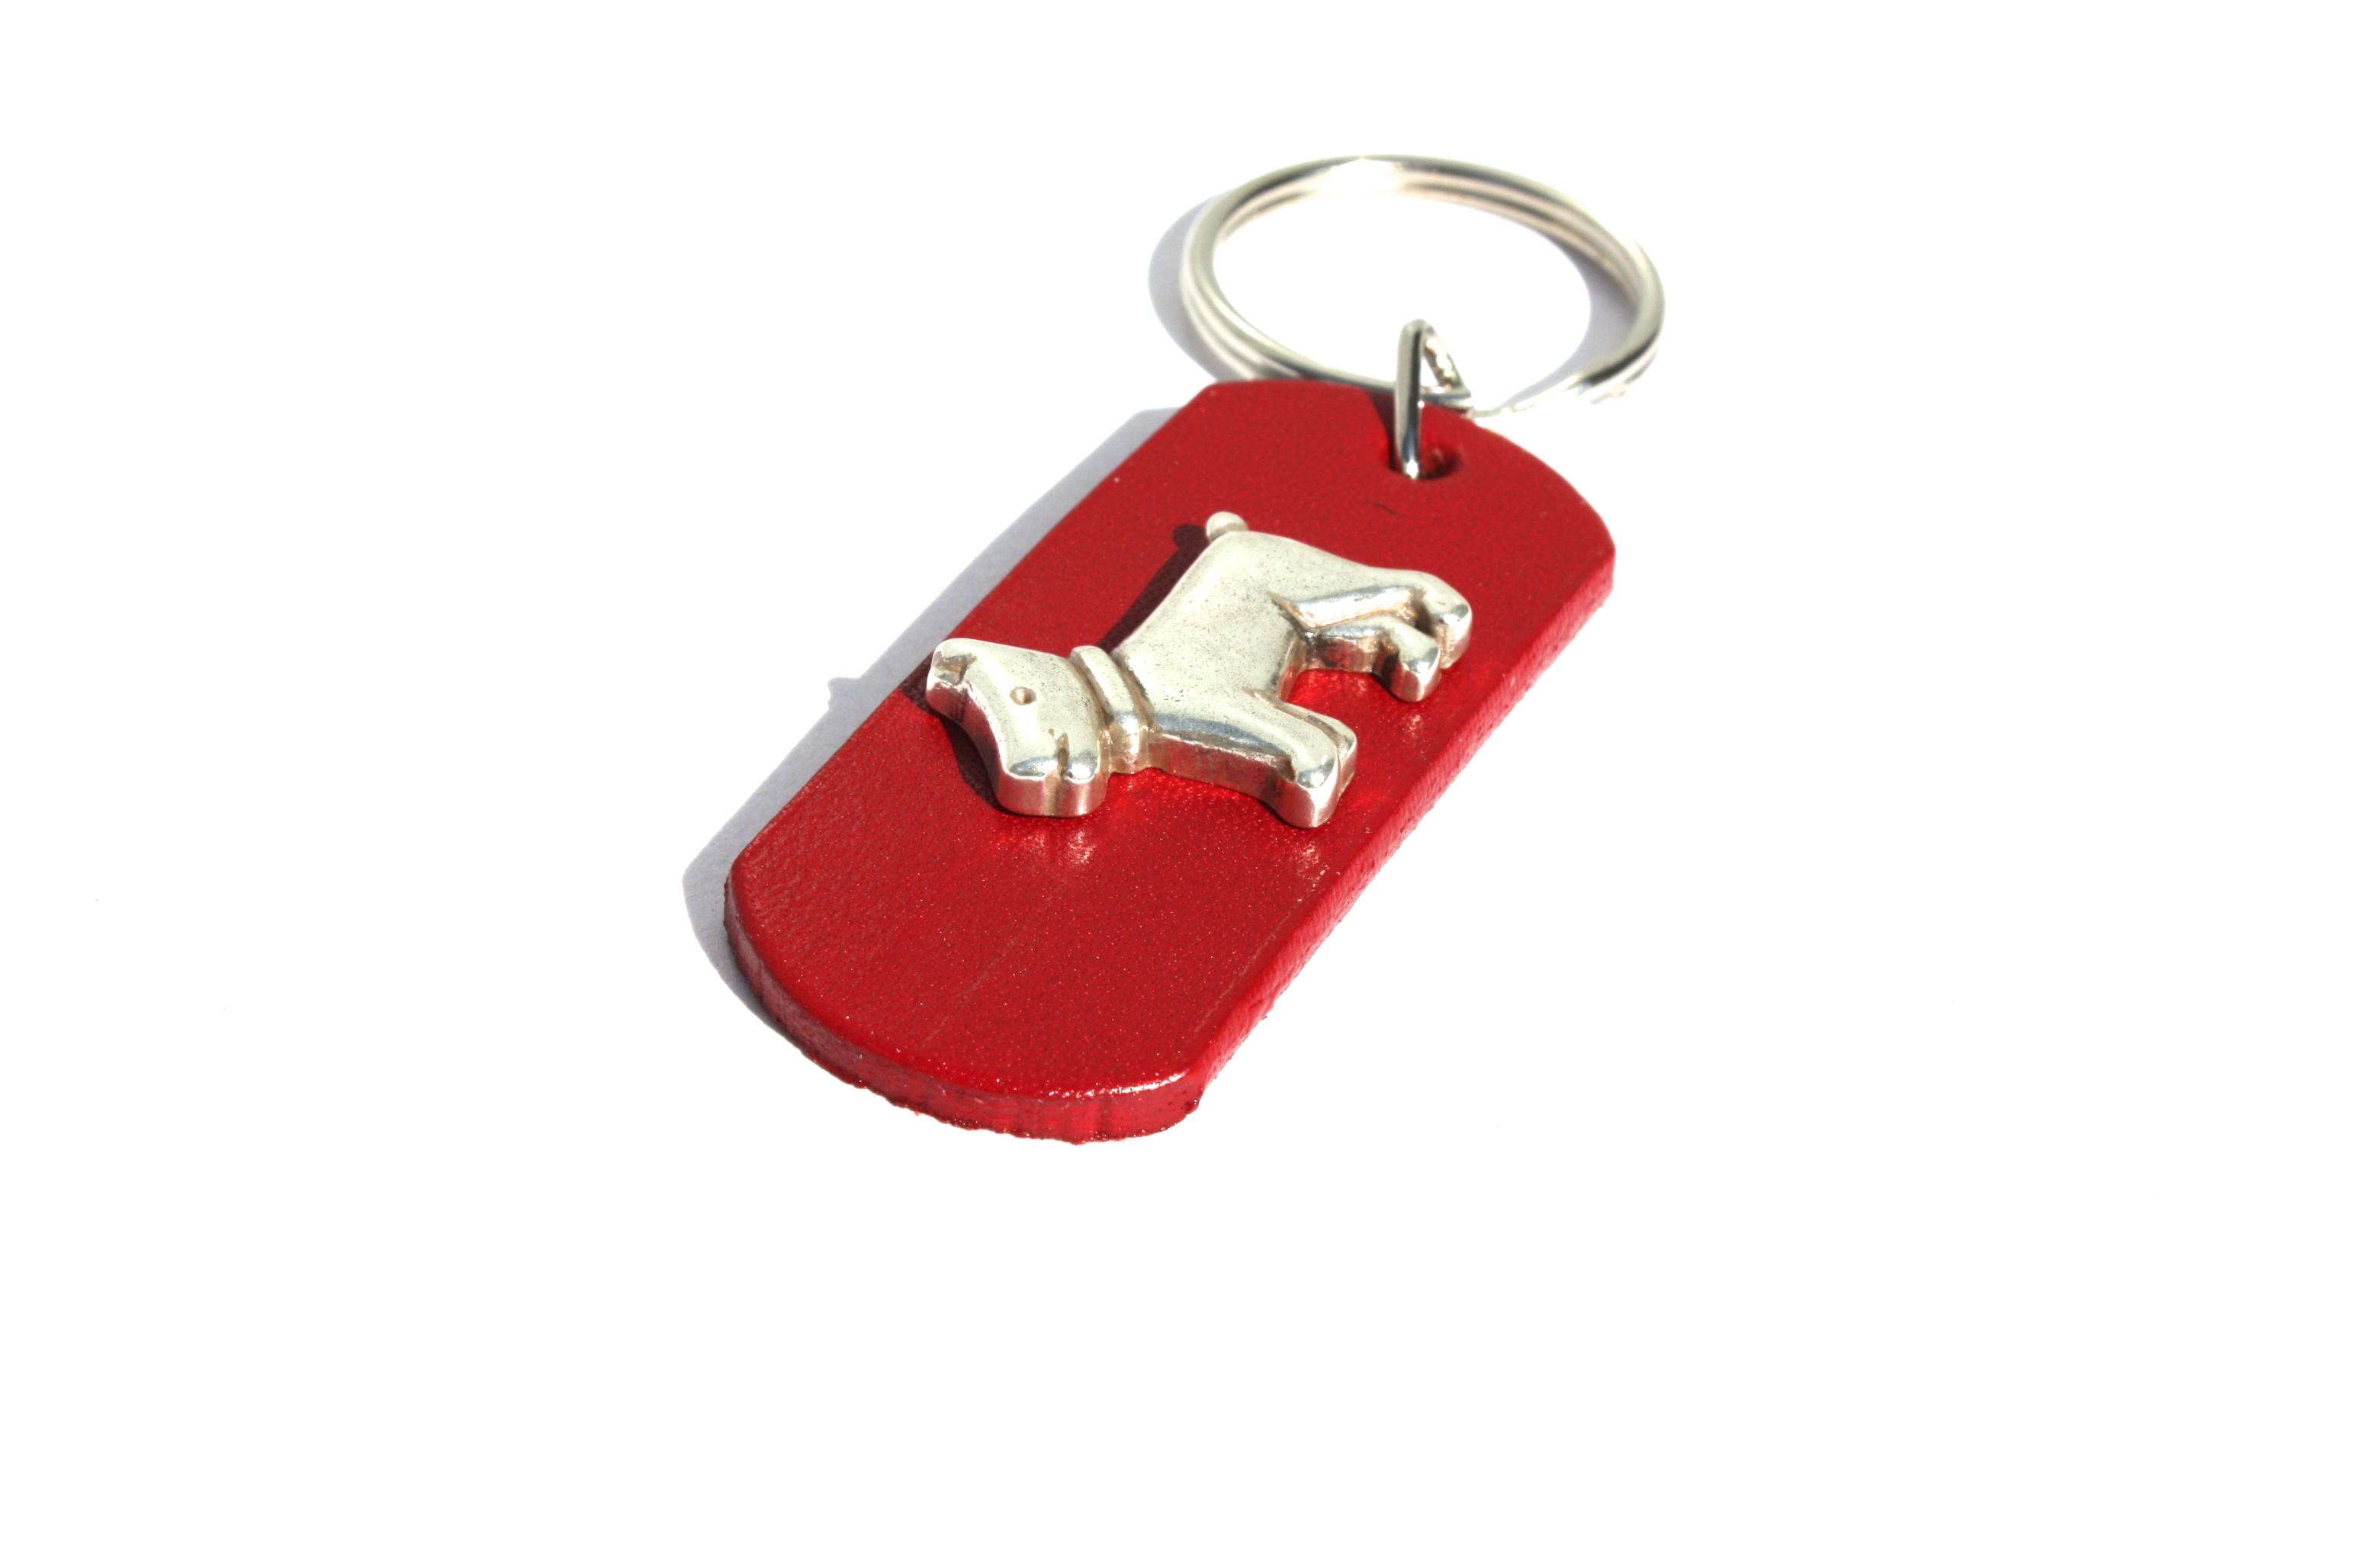 Dog La KEY CHAIN ドグラ キーチェーン_d0217958_12483028.jpg